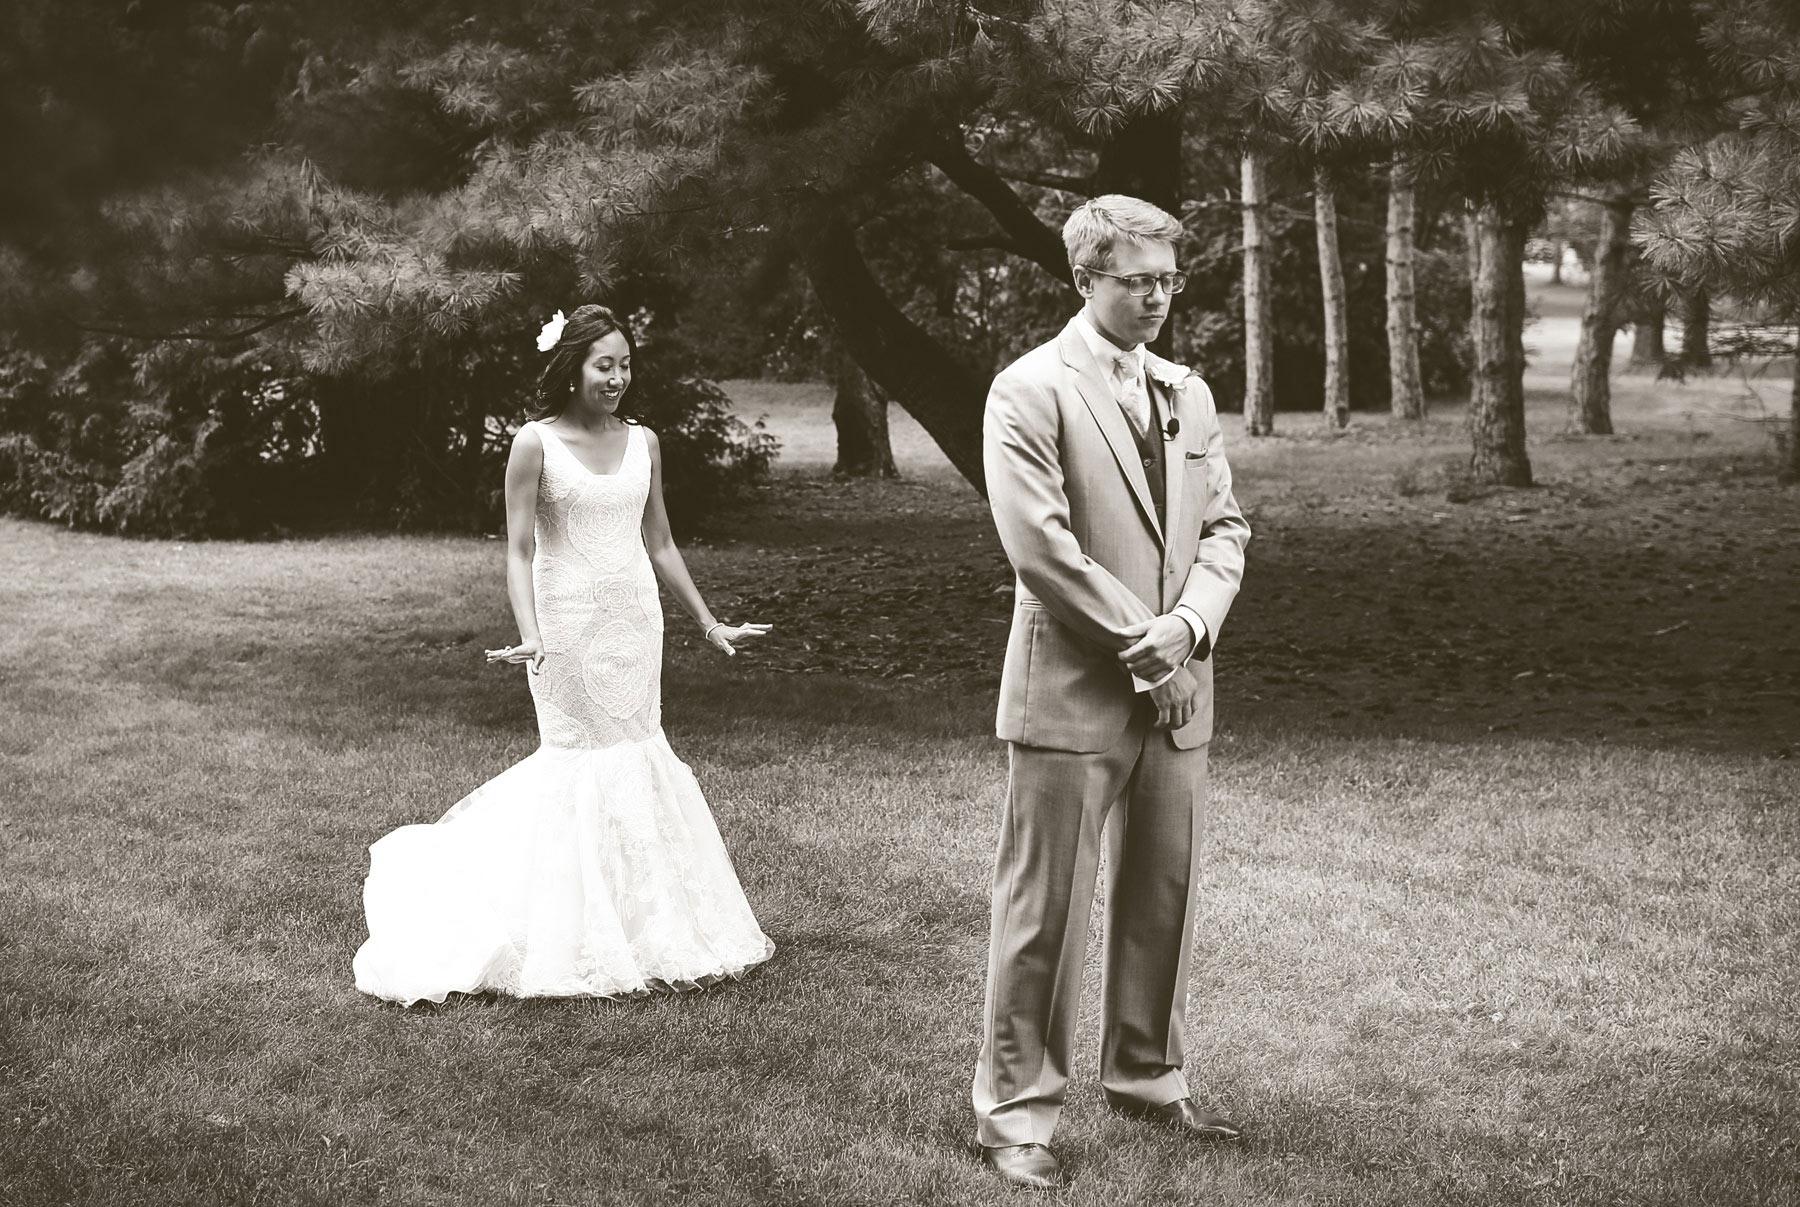 02-Minneapolis-Minnesota-Wedding-Photography-by-Vick-Photography-Garden-First-Look-Daphne-&-Austin.jpg